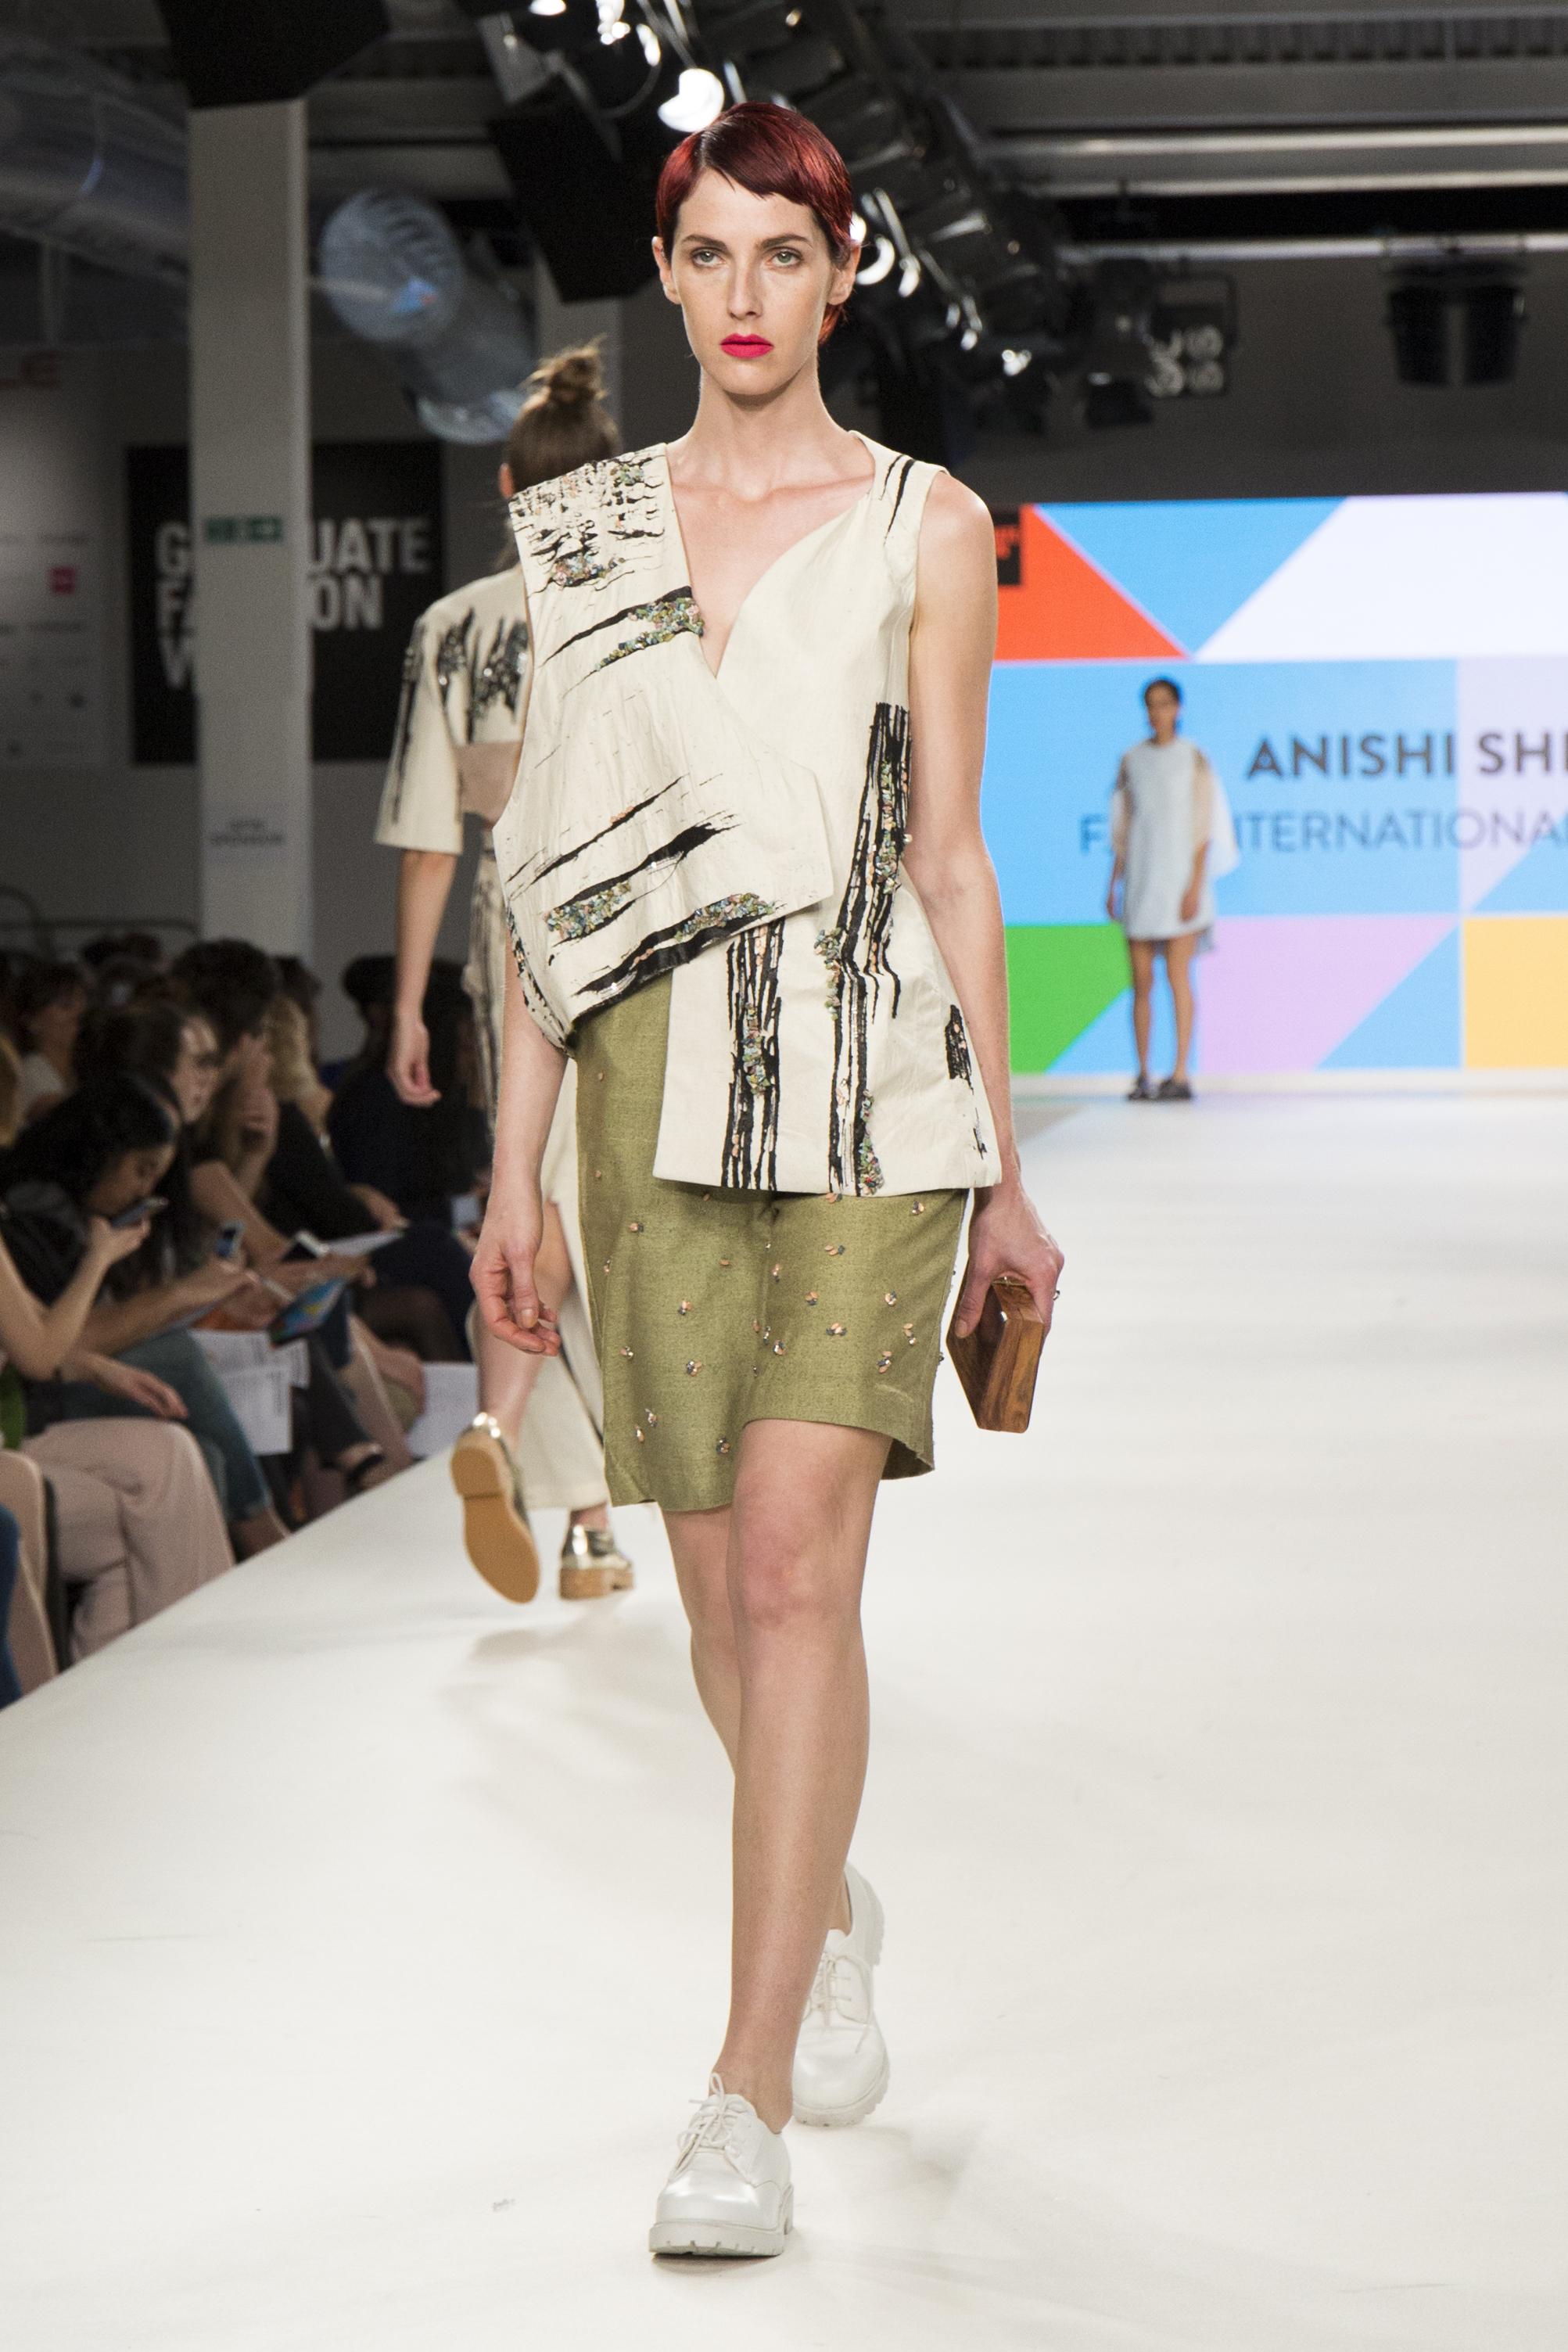 Anishi Sheth_InternationalShow_LaurenMustoe-5.jpg